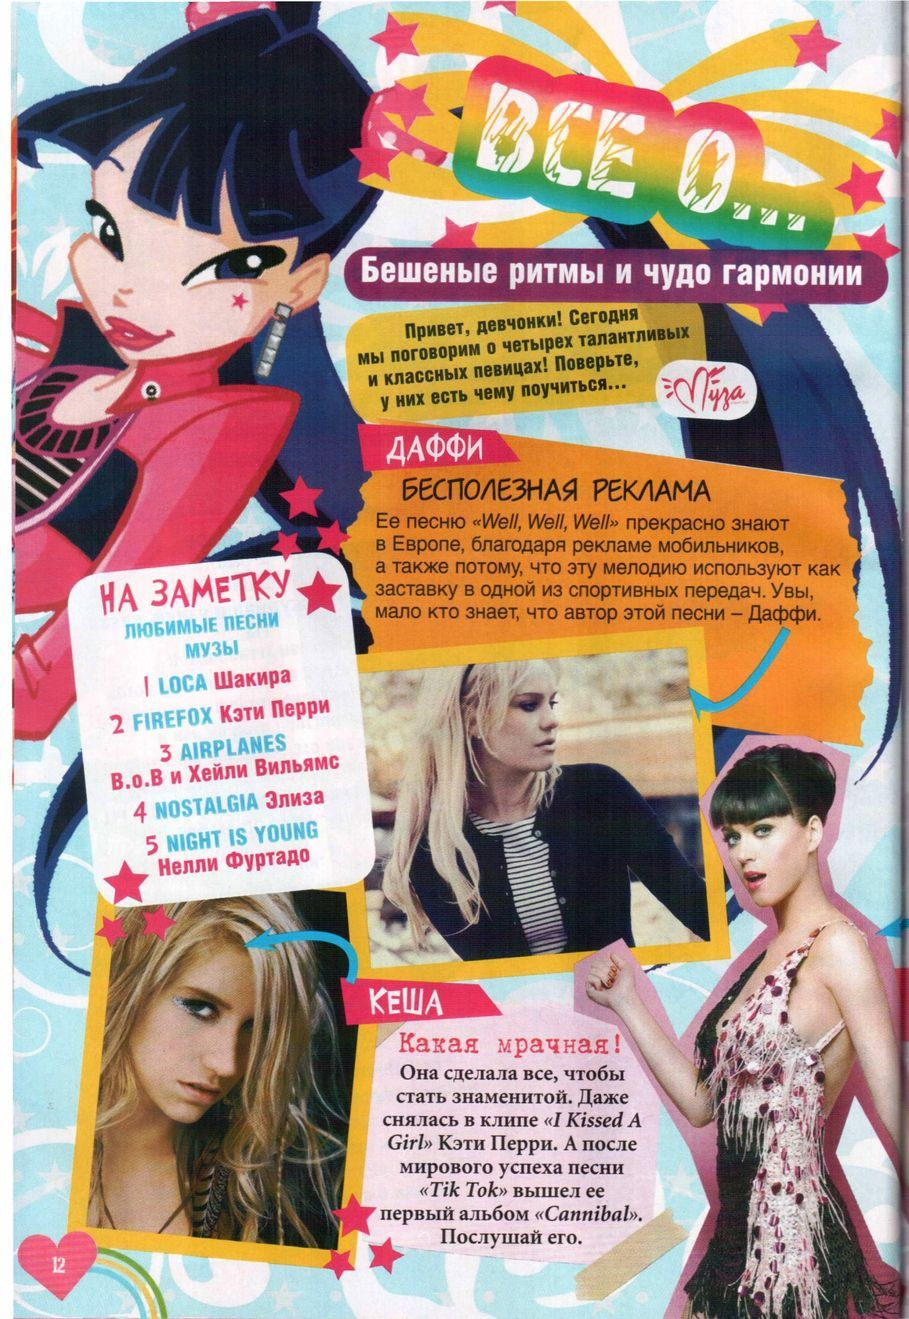 Комикс Винкс Winx - Опасный замысел (Журнал Винкс №10 2011) - стр. 12